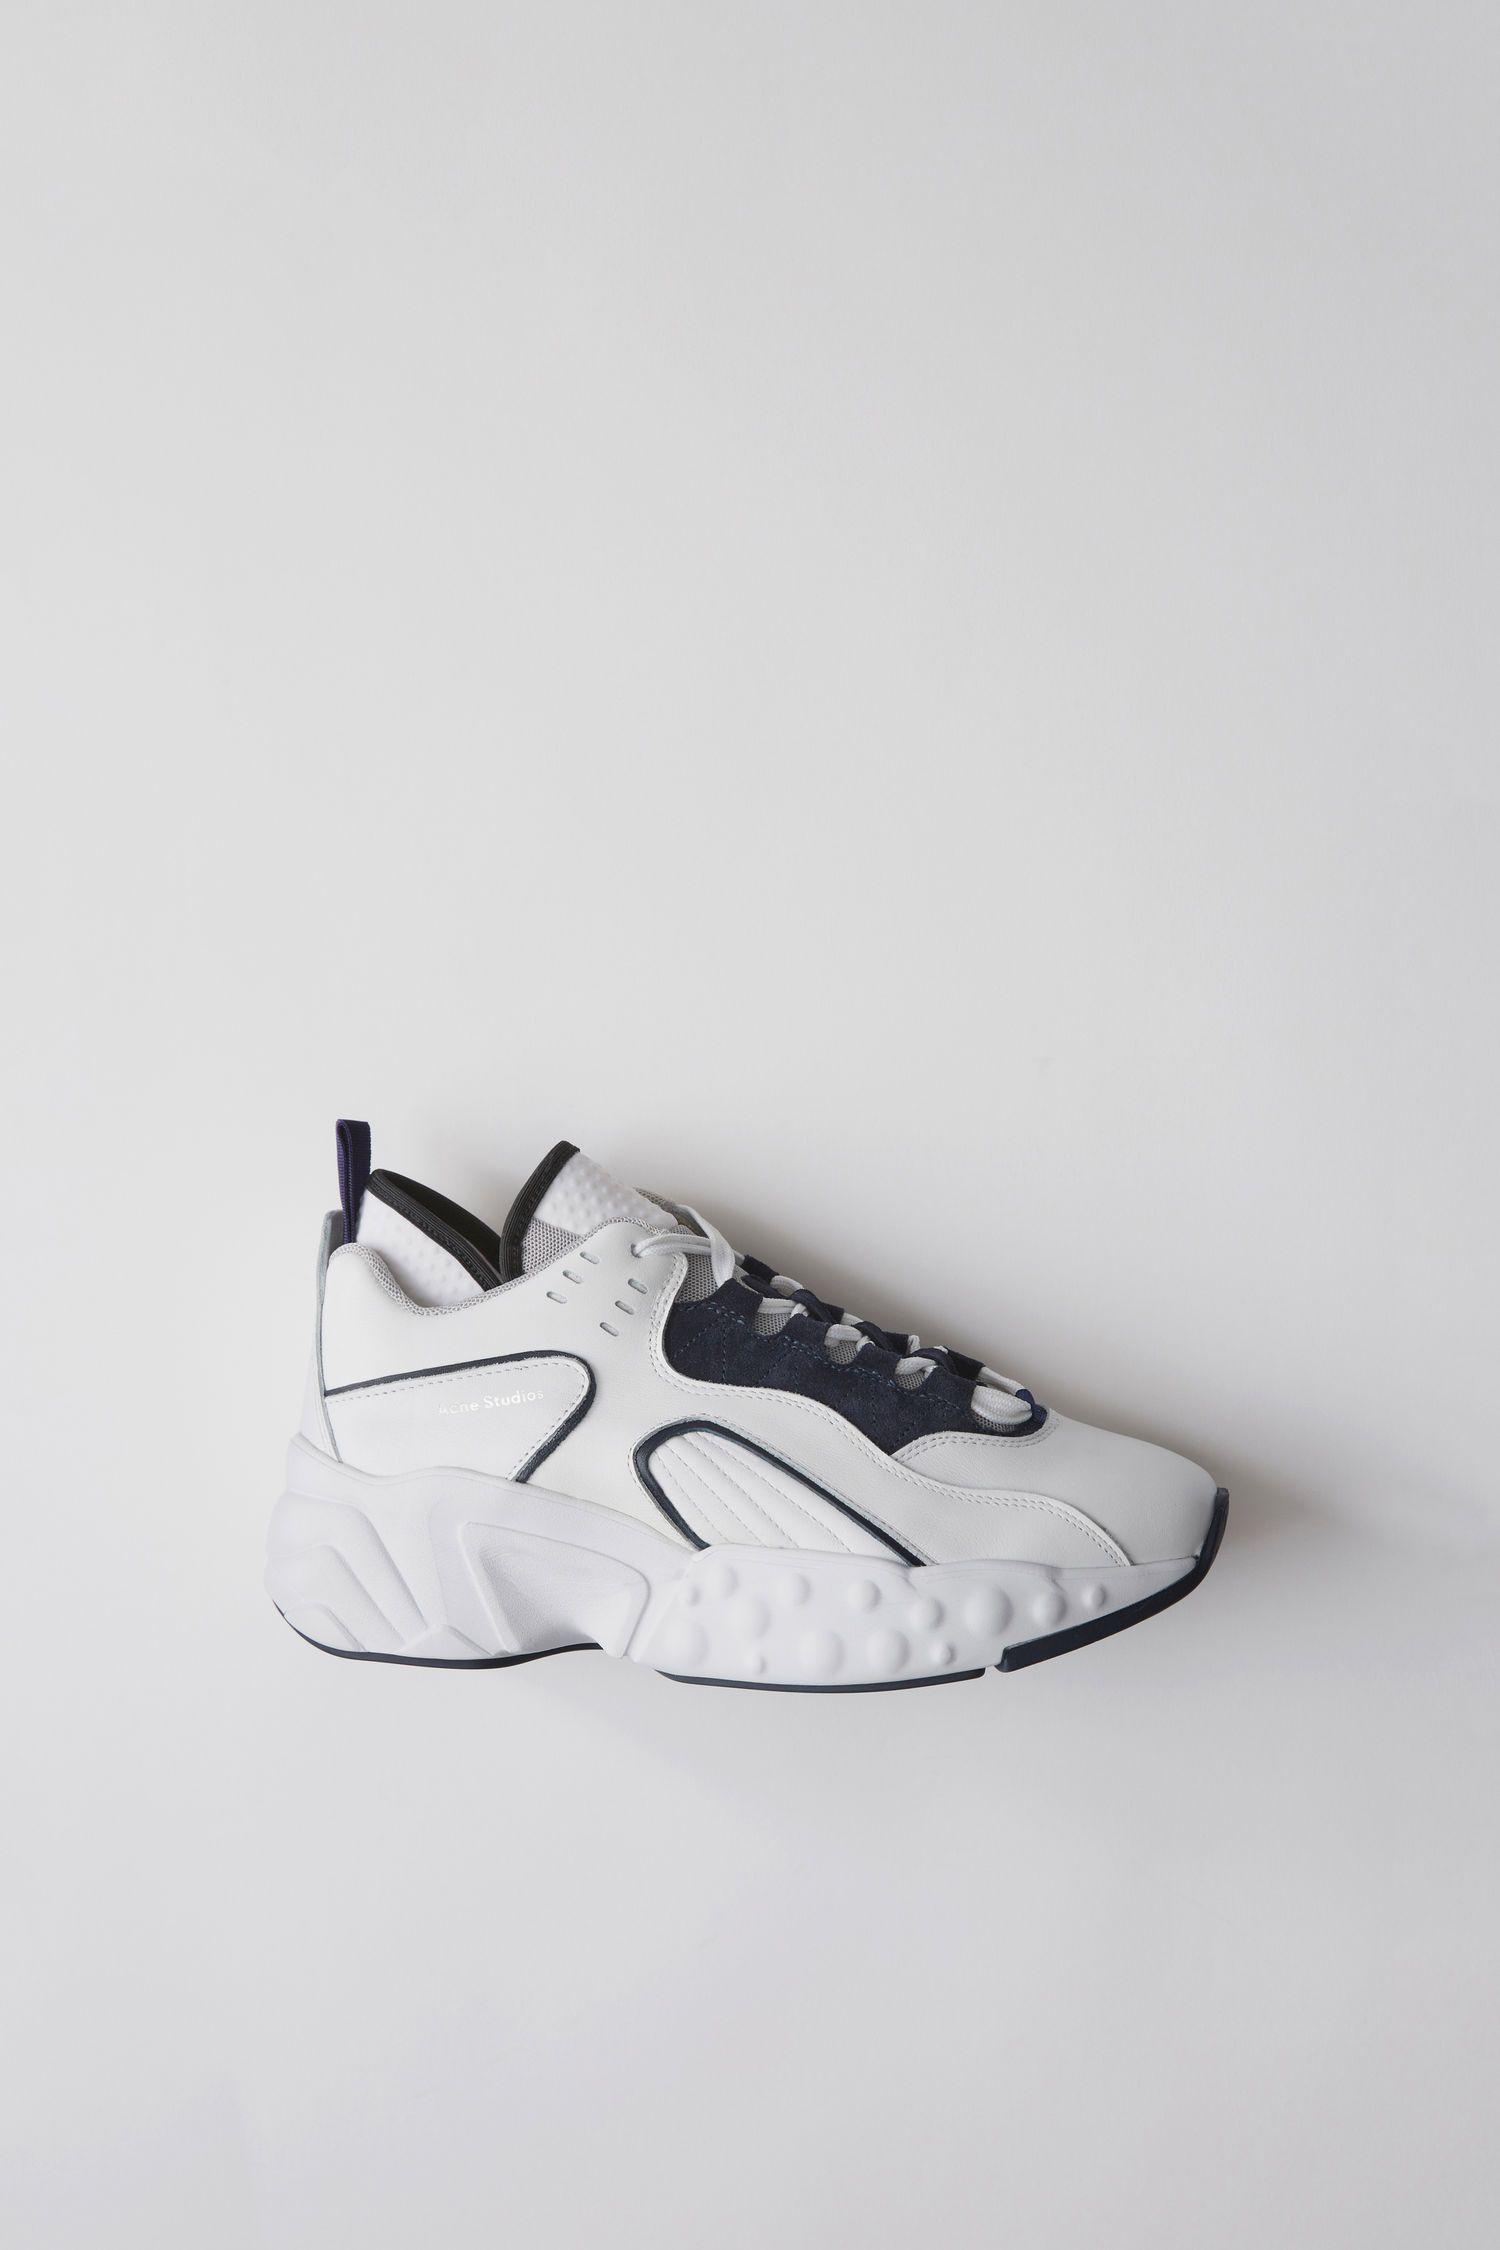 Manhattan Sneakers Multi White 470 Dad Shoes Trending Sneakers